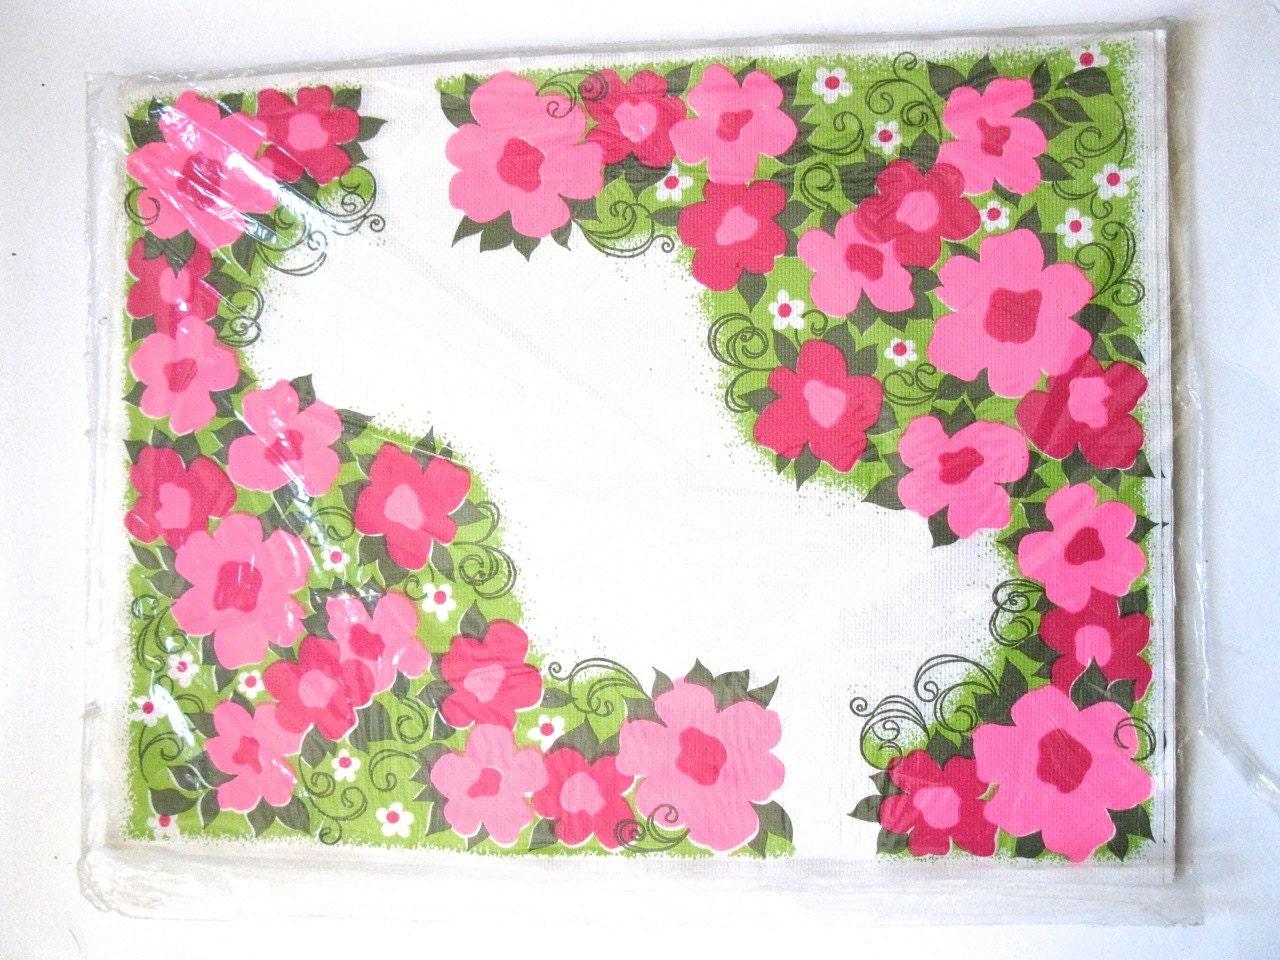 paper placemats set of 14 vintage retro floral by vintagecommon